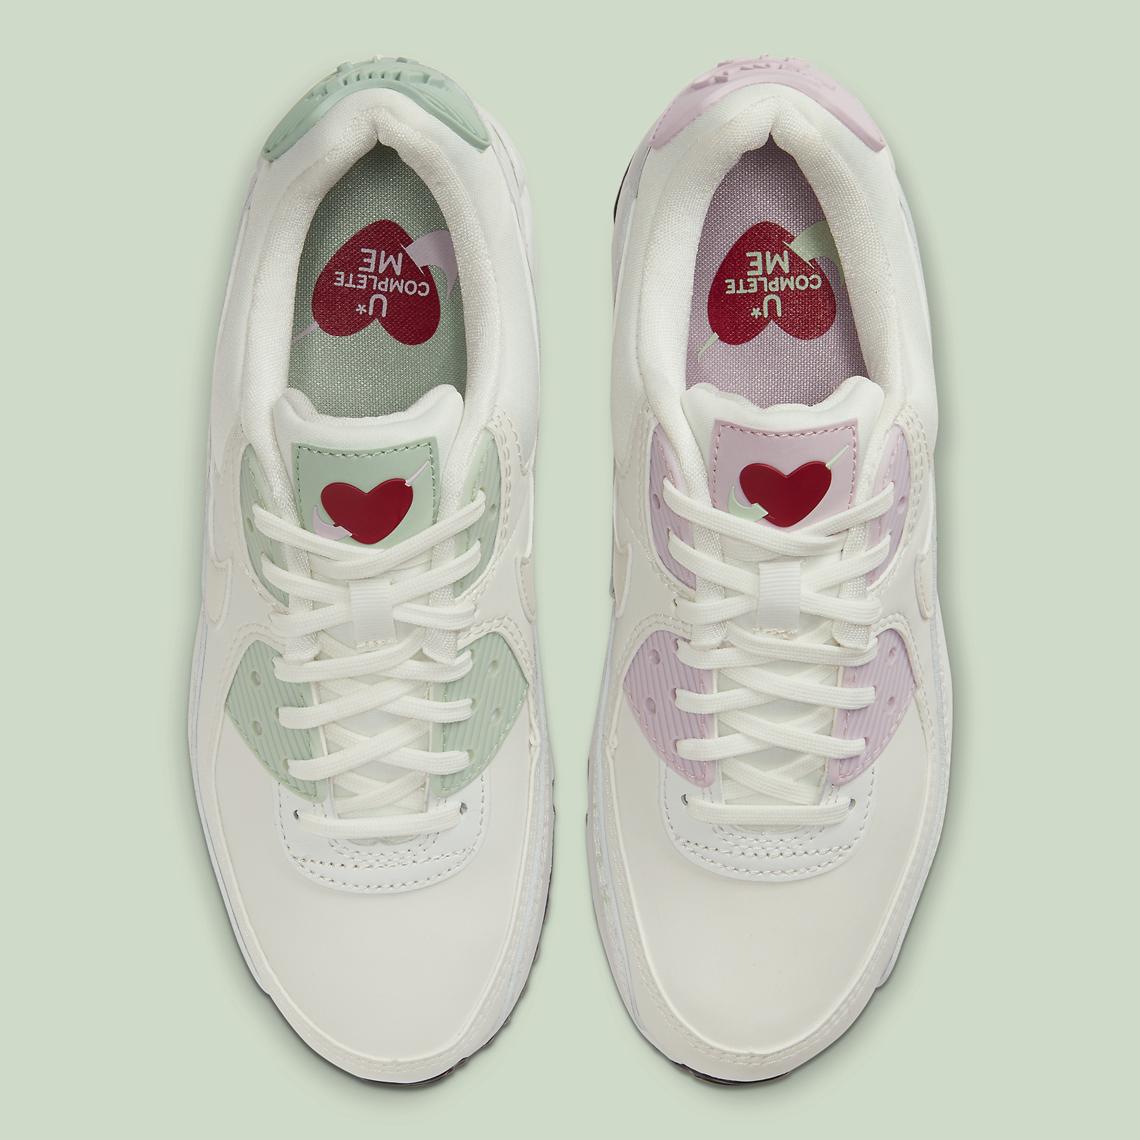 Nike Air Max 90 Valentine's Day CI7395